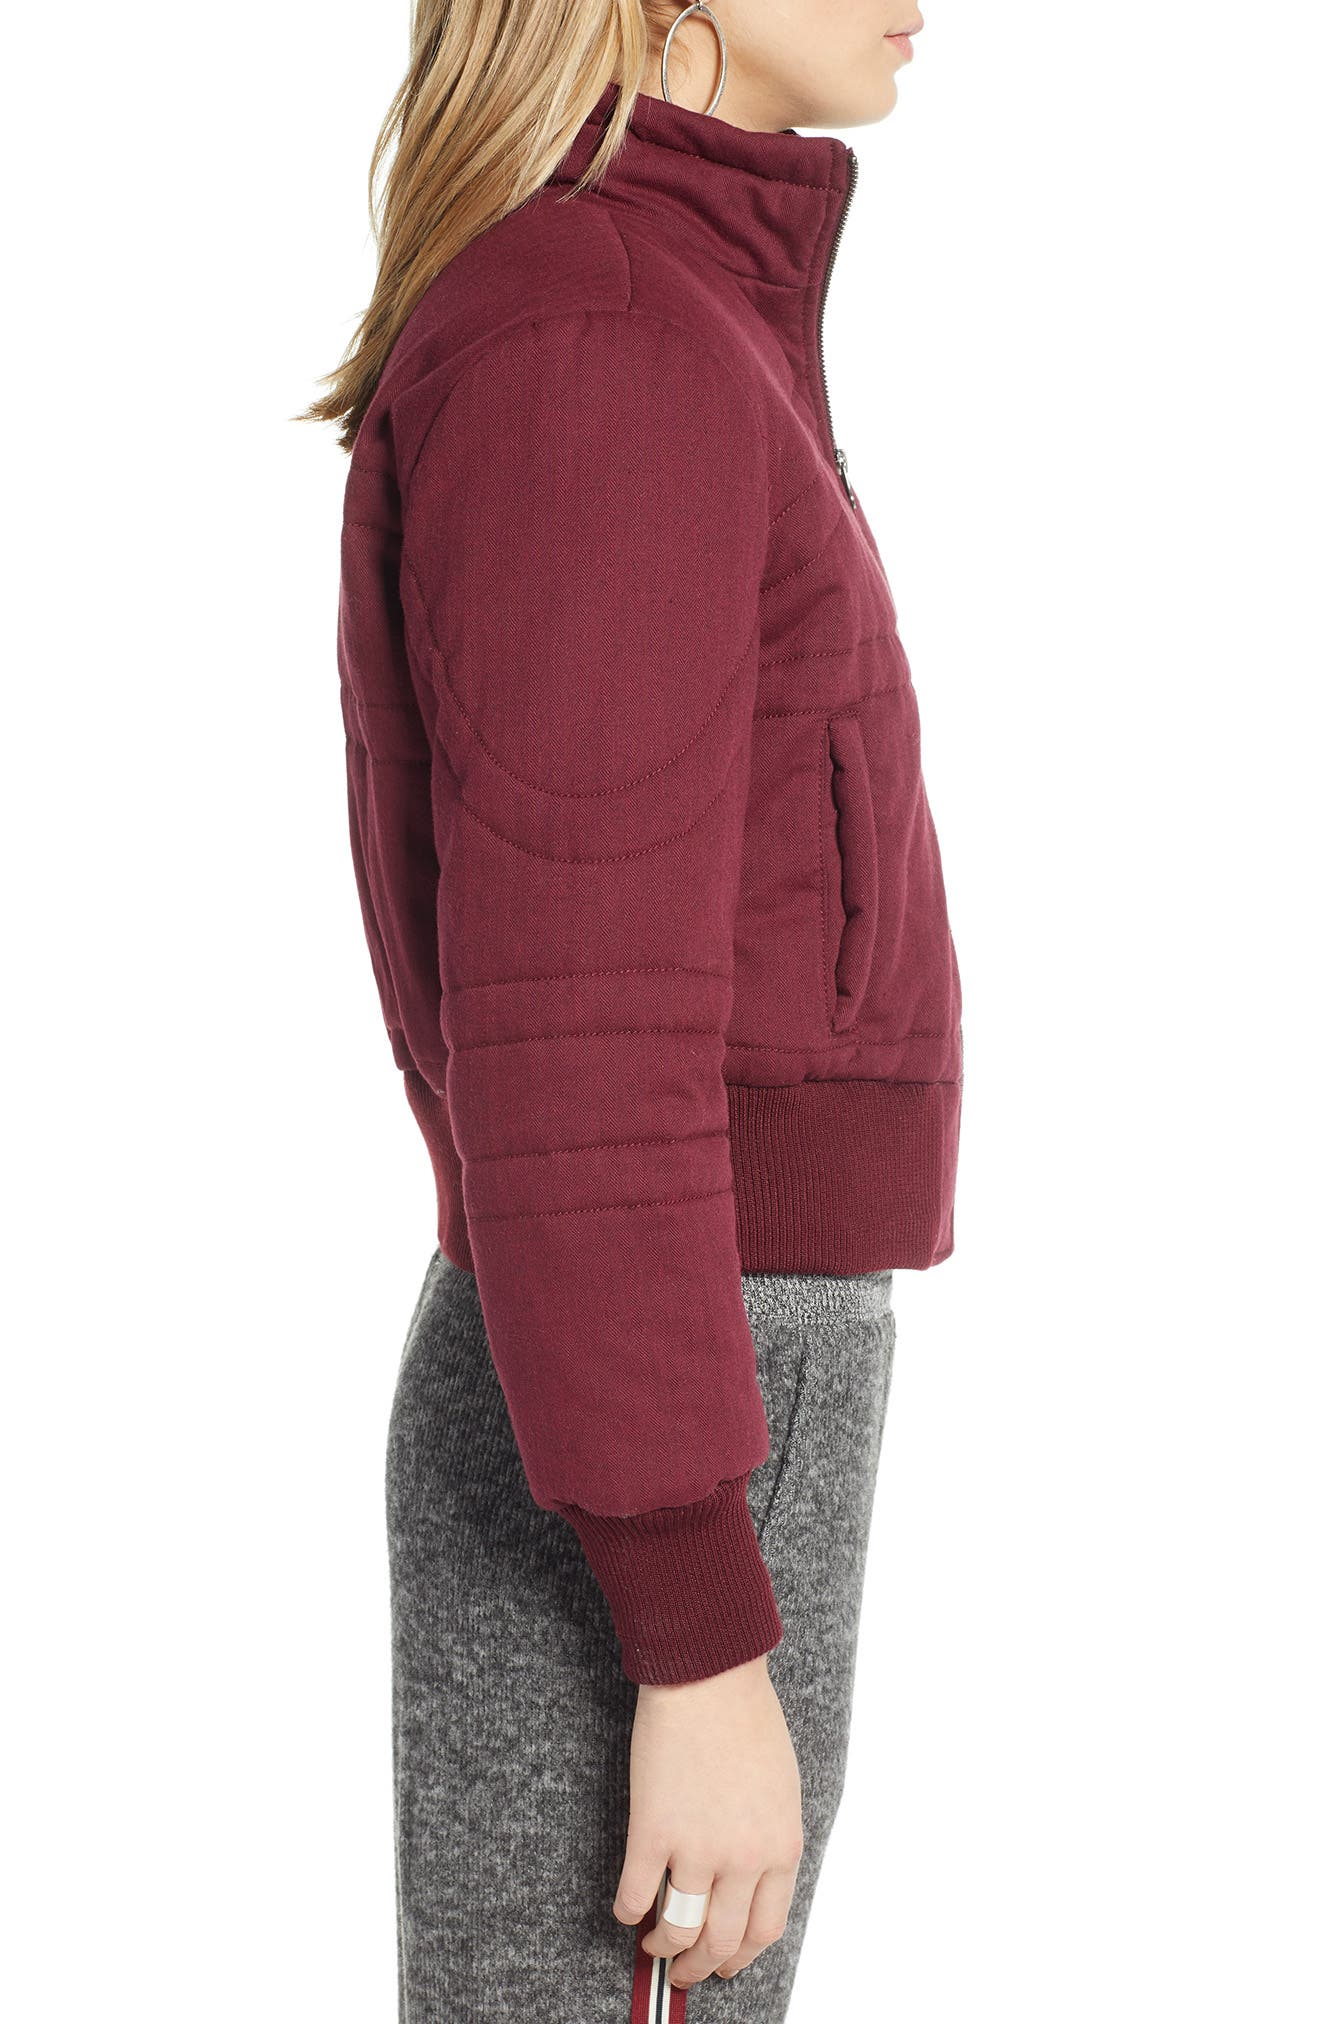 TREASURE & BOND, Flannel Crop Puffer Jacket, Alternate thumbnail 3, color, RED TANNIN HEATHER